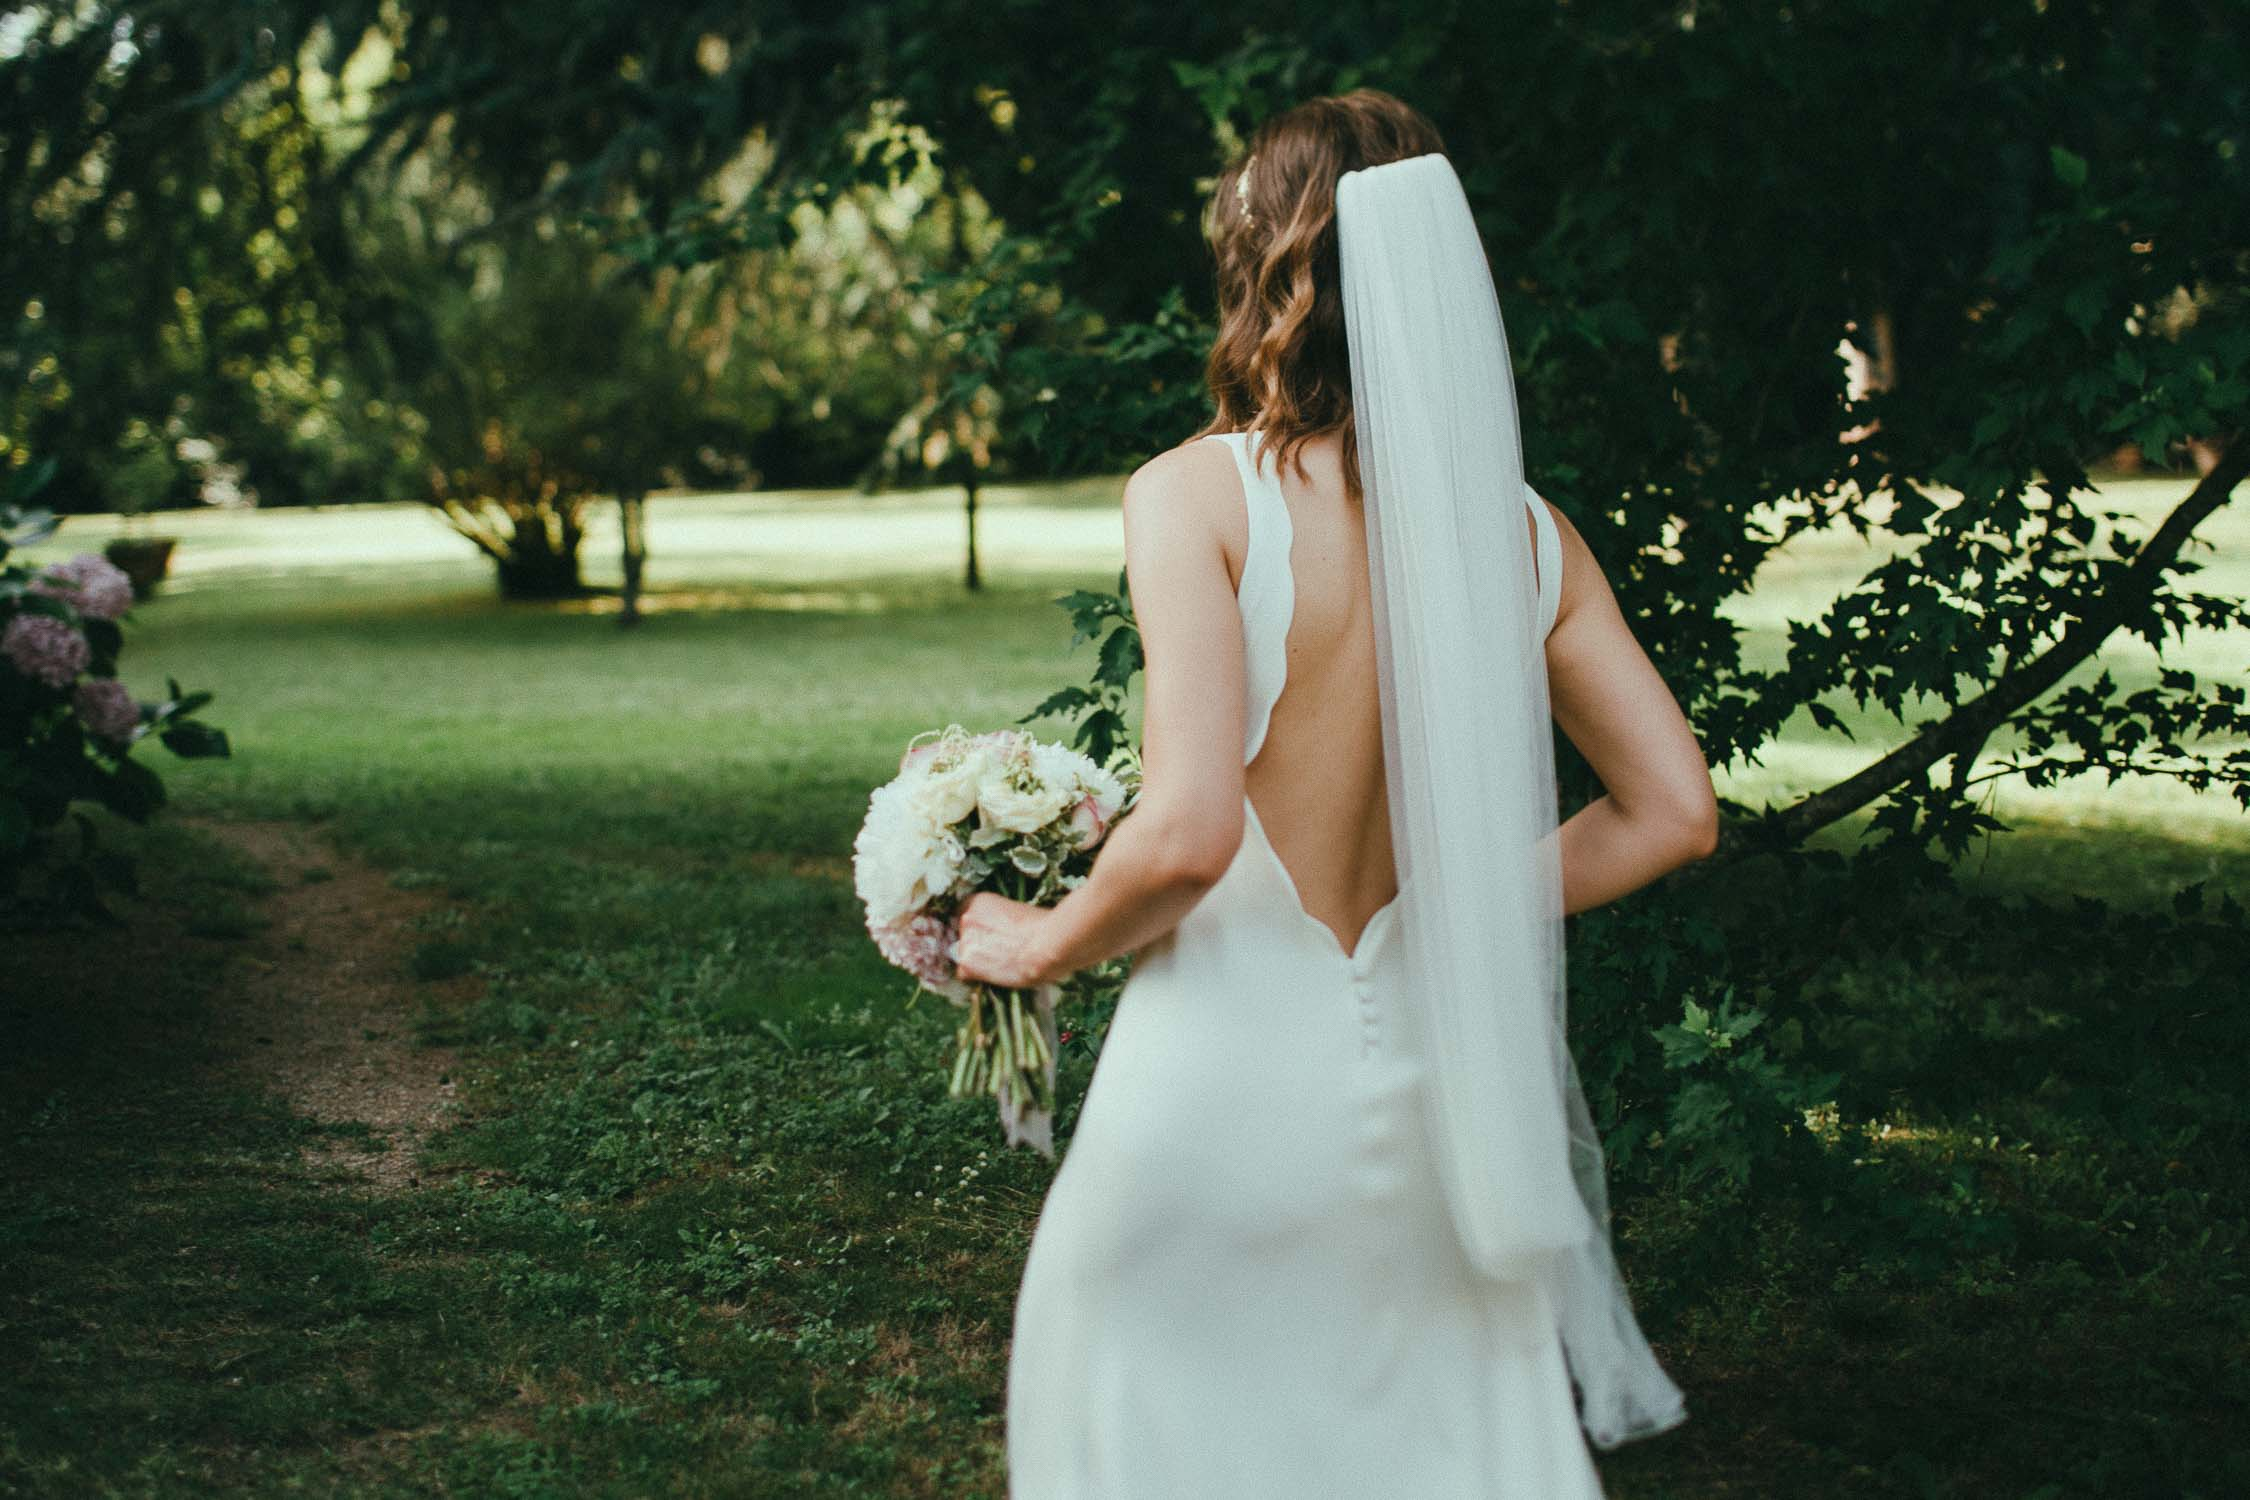 couple-portraits-destination-wedding (2).jpg